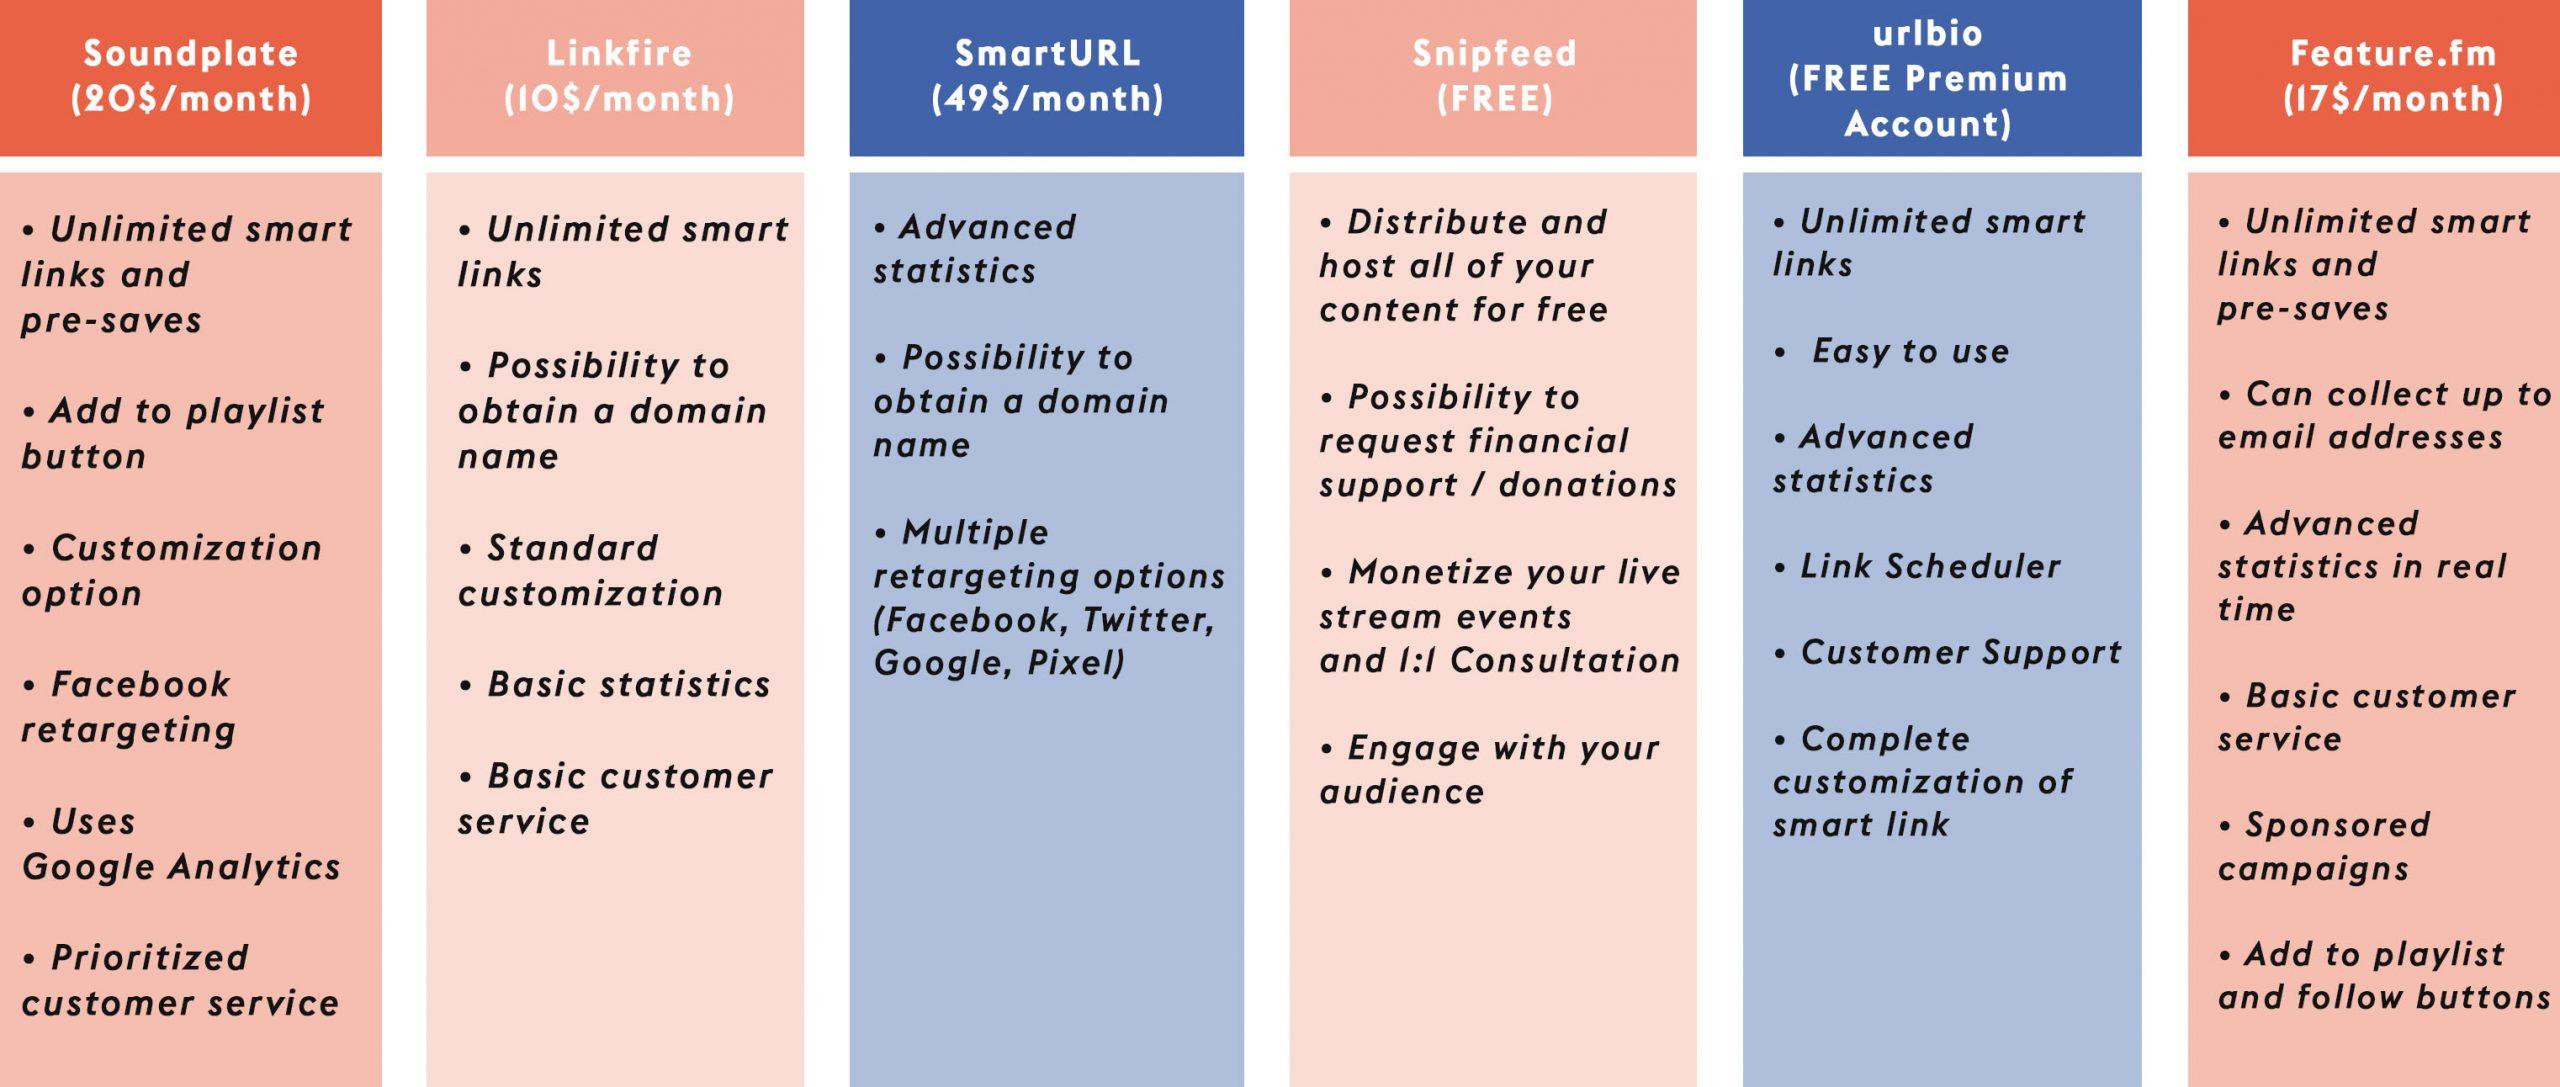 Comparison chart of smart link platforms - Snipfeed, Linkfire, Soundplate, urlbio, Feature.fm, SmartURL